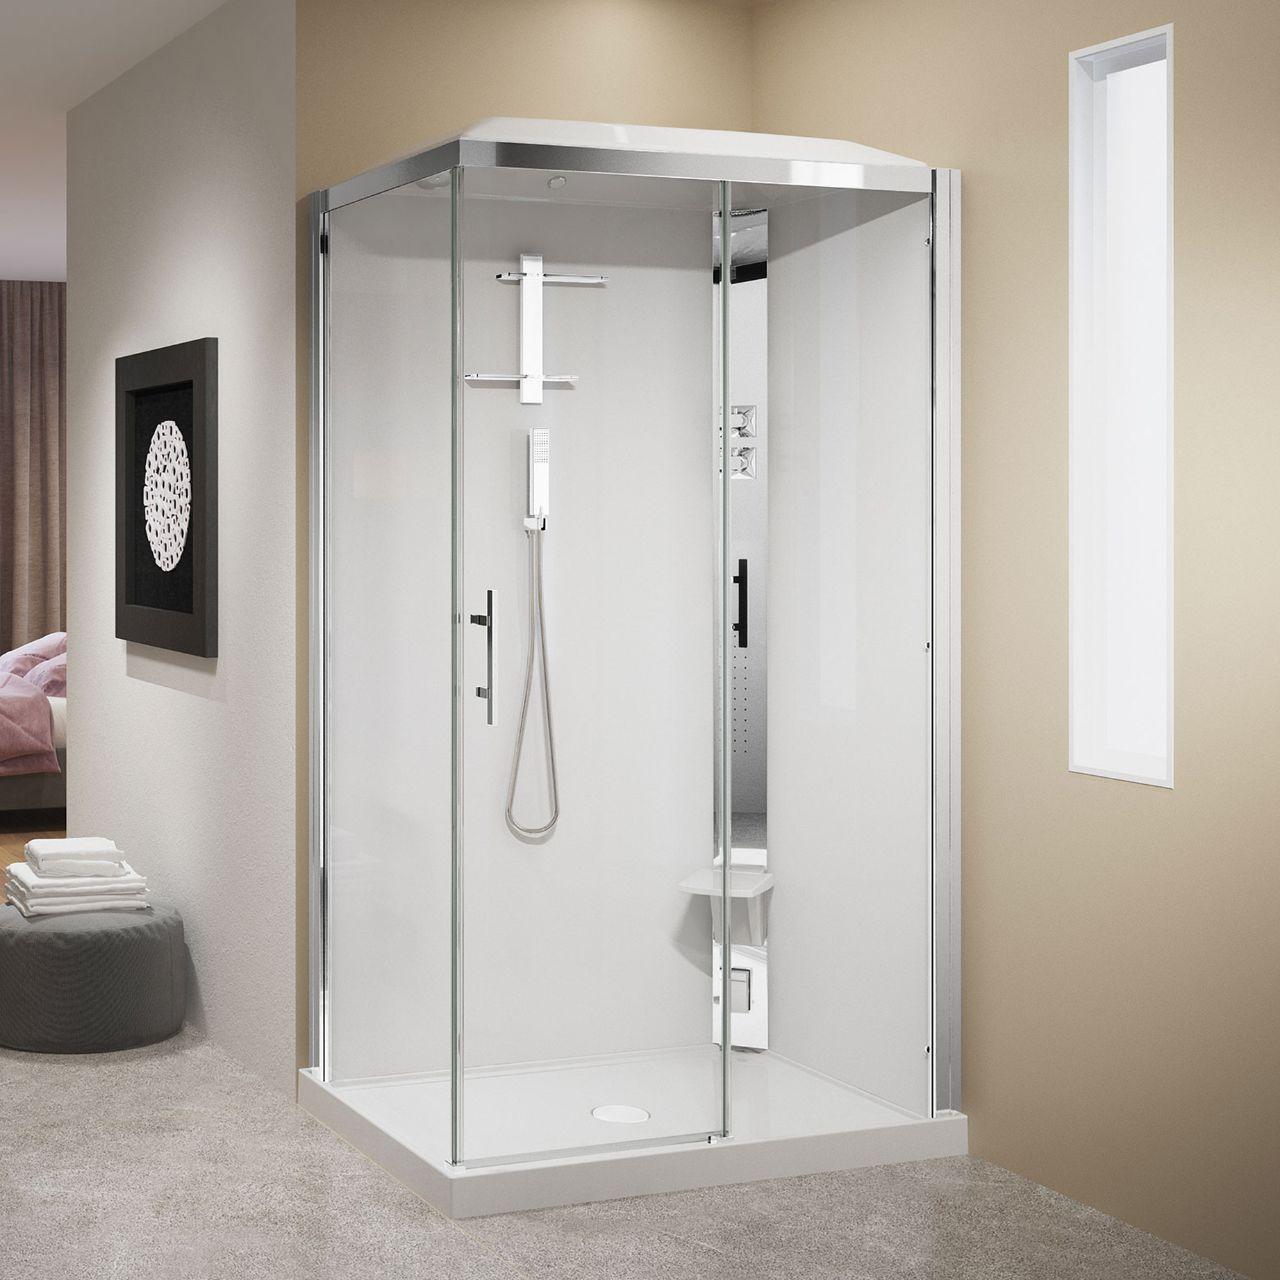 emejing novellini box doccia prezzi images. Black Bedroom Furniture Sets. Home Design Ideas